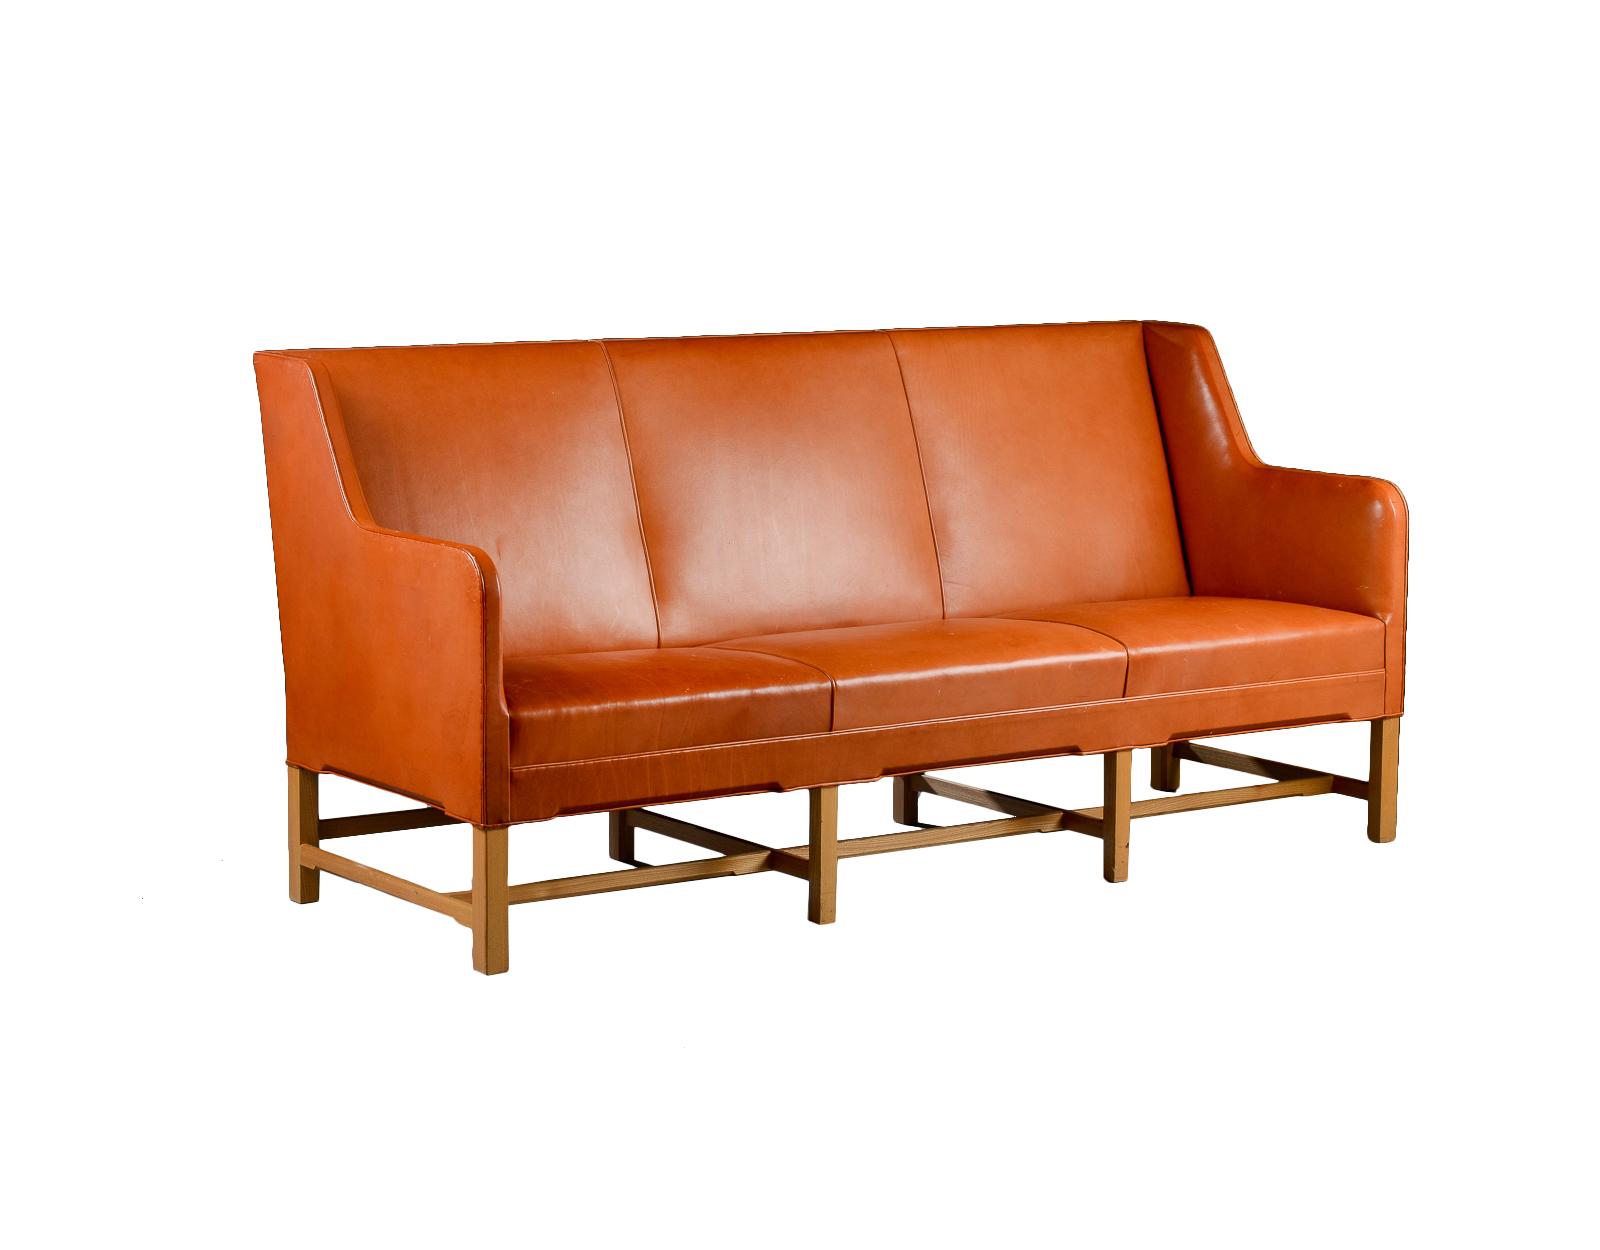 Kaare Klint three-seater sofa